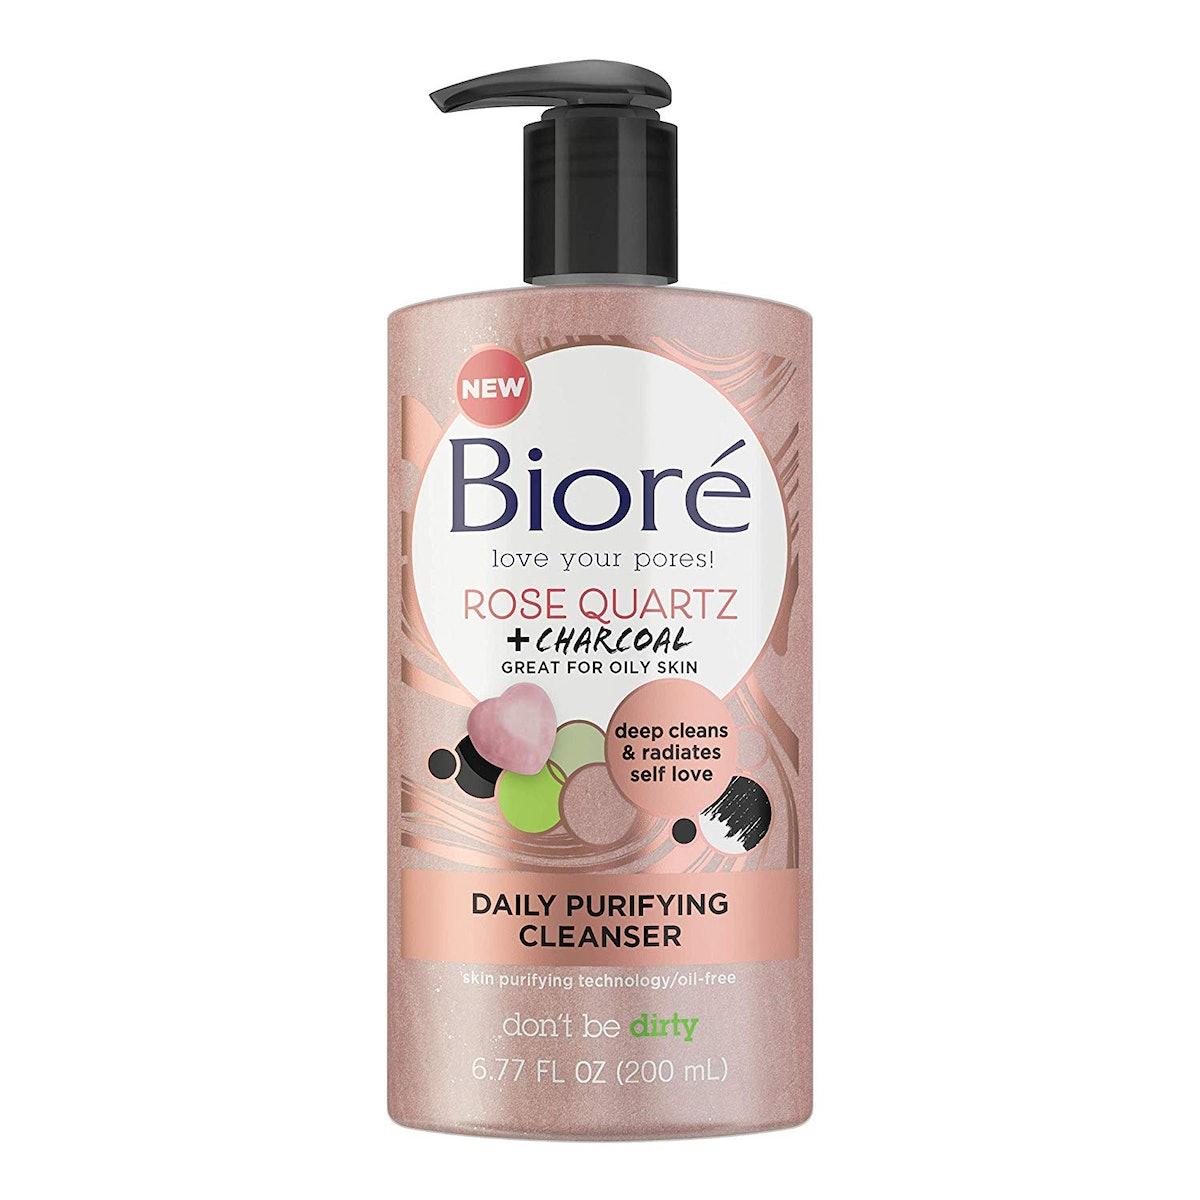 Bioré Rose Quartz + Charcoal Daily Purifying Cleanser